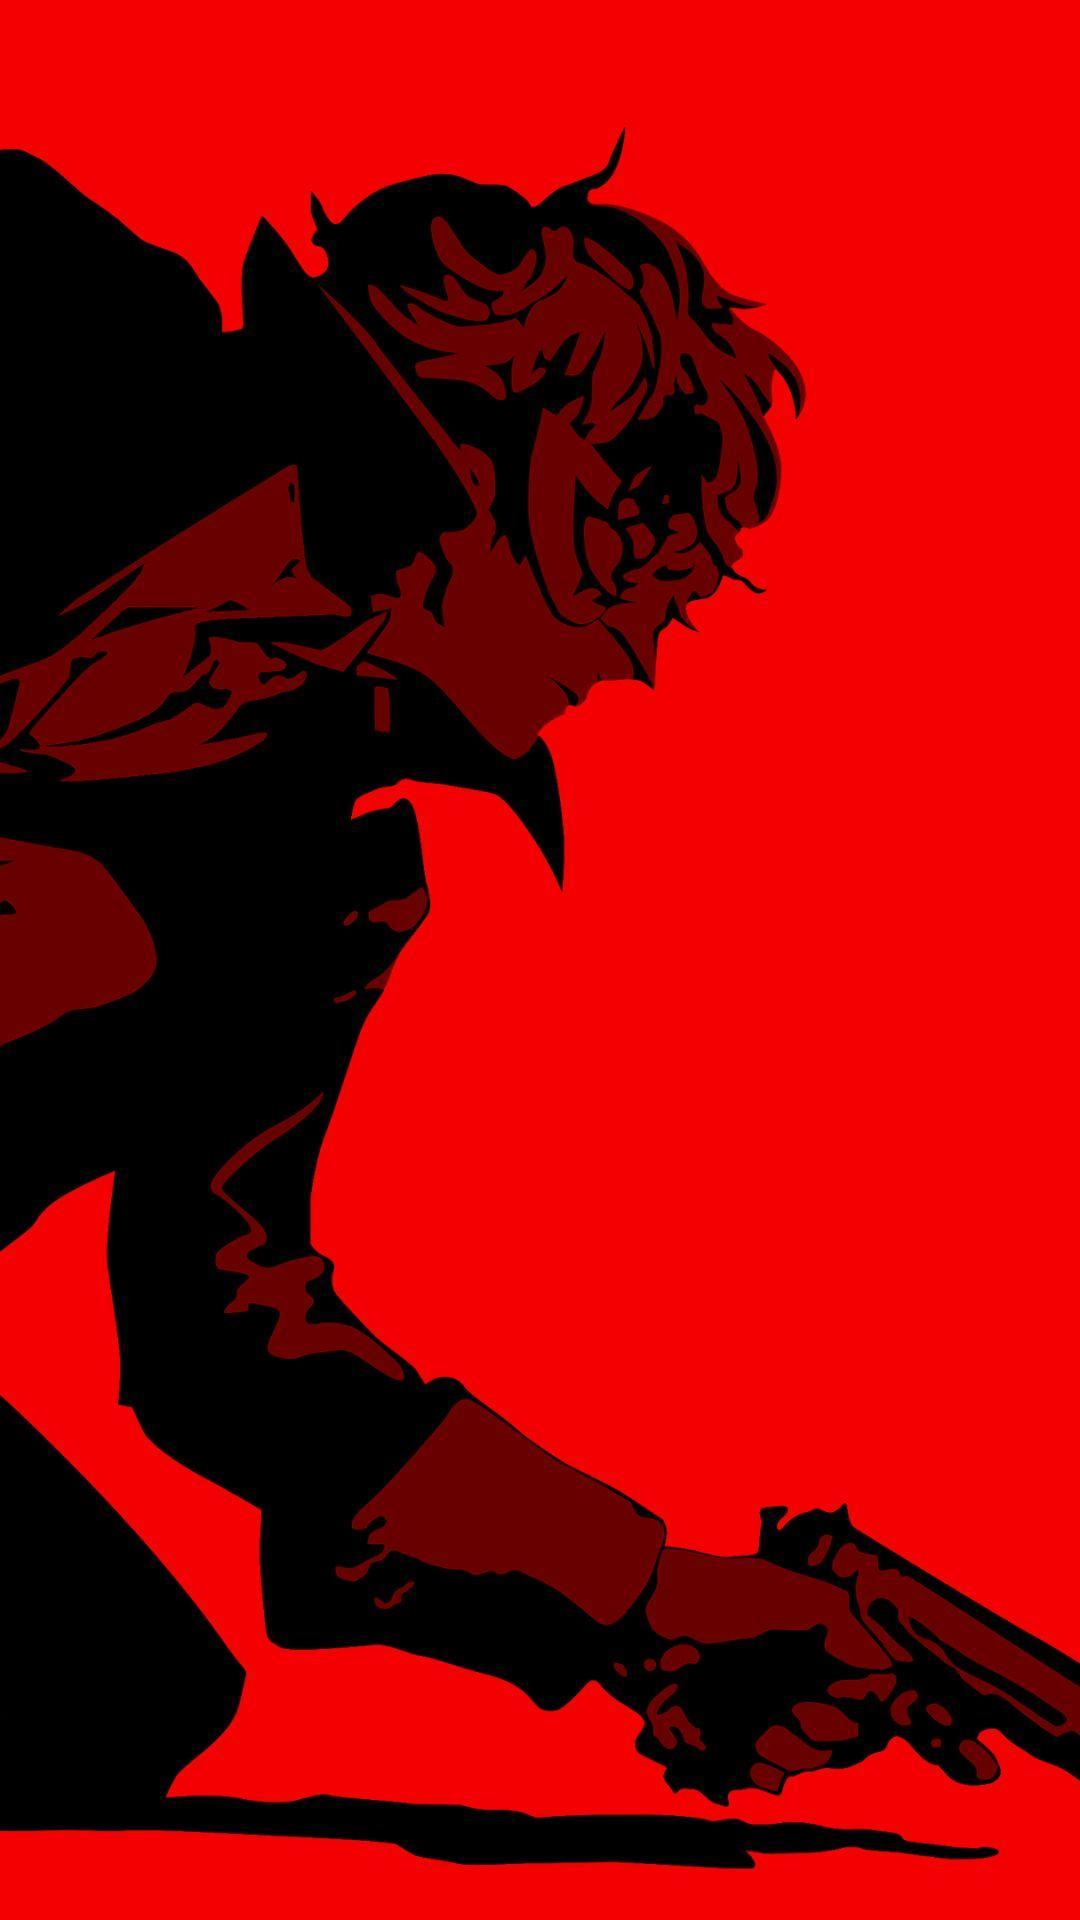 Persona 5 Wallpapers - Wallpaper Cave